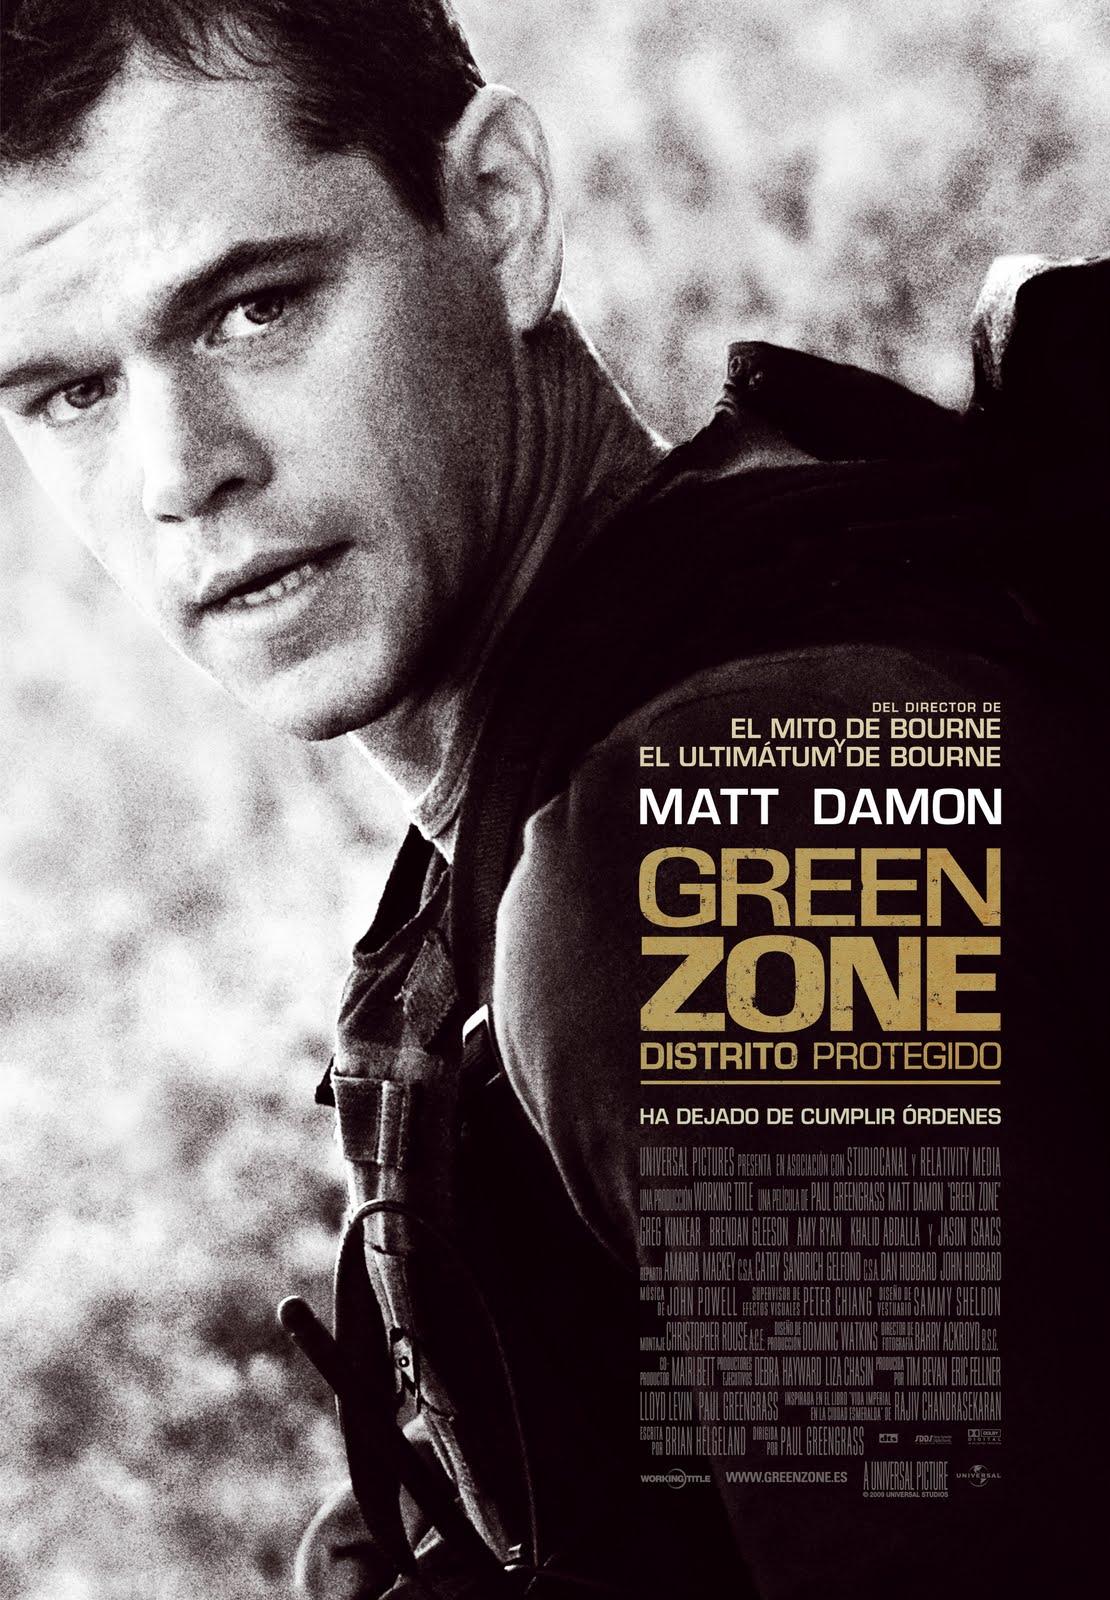 http://2.bp.blogspot.com/_t2NLf0Xf0i4/S8N8NjI2DyI/AAAAAAAAFrI/zx-_7fzjE38/s1600/2010+-+Green+Zone+Distrito+protegido+-+Green+Zone+-+tt0947810.jpg